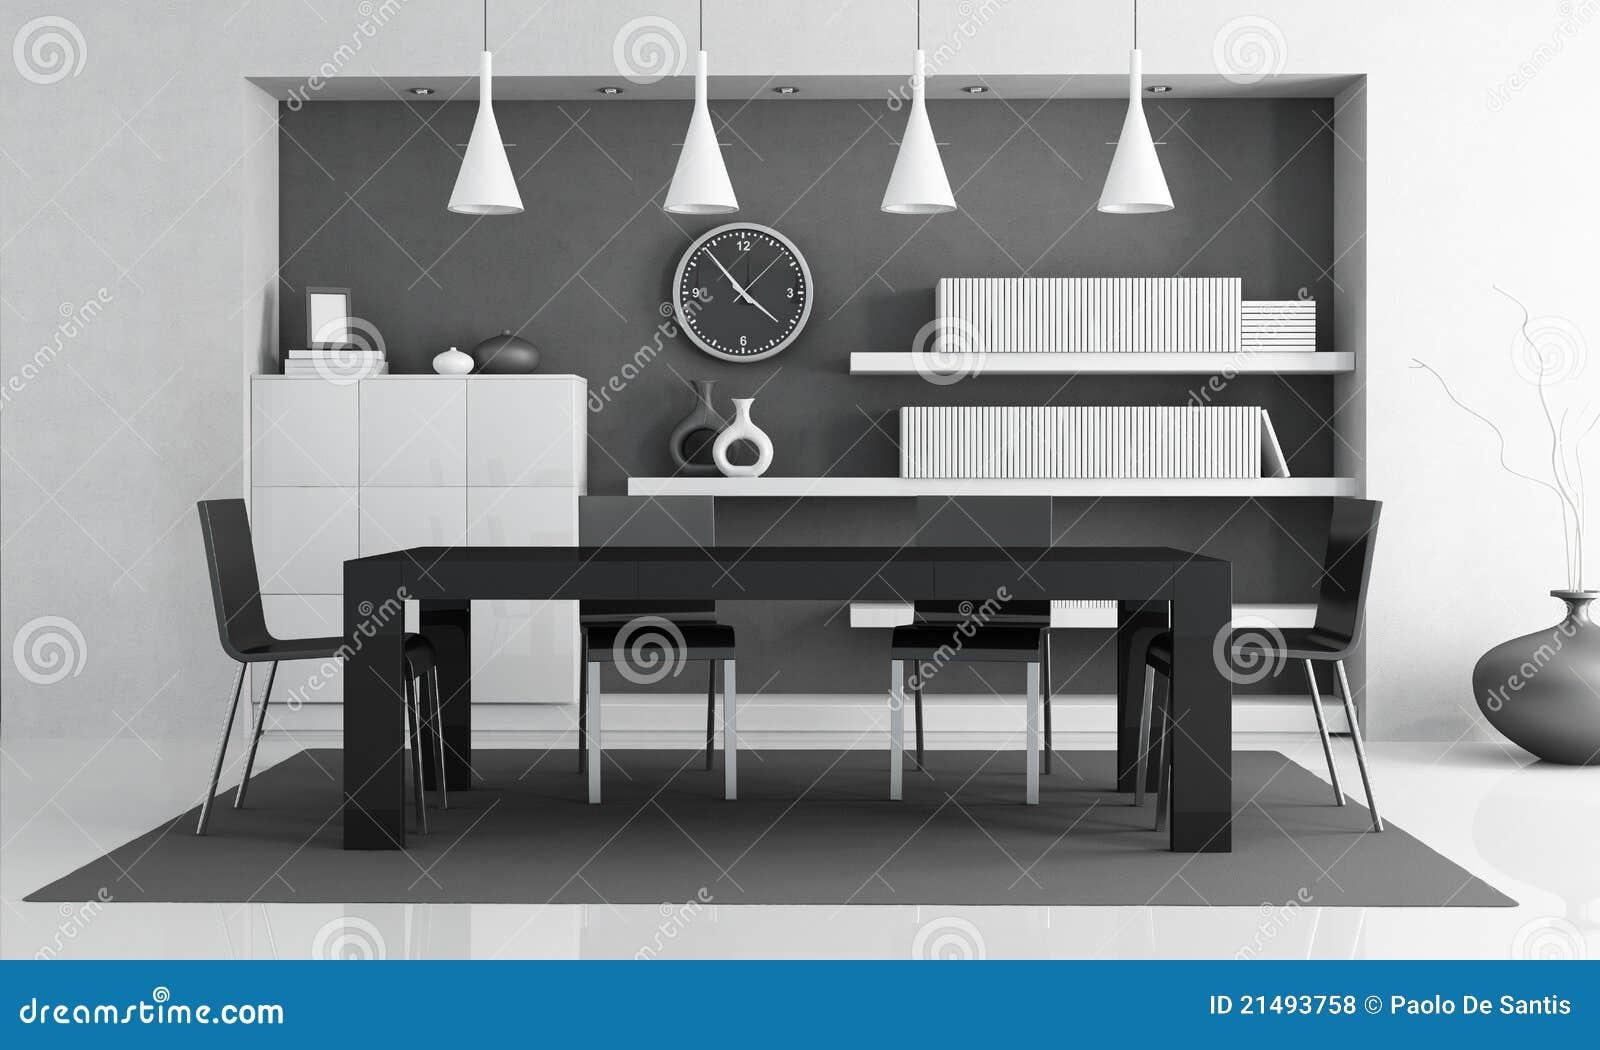 Nieuwe Badkamer Assen ~ Picture idea 27  Moderne eetkamer l? met witte stoelen en muur